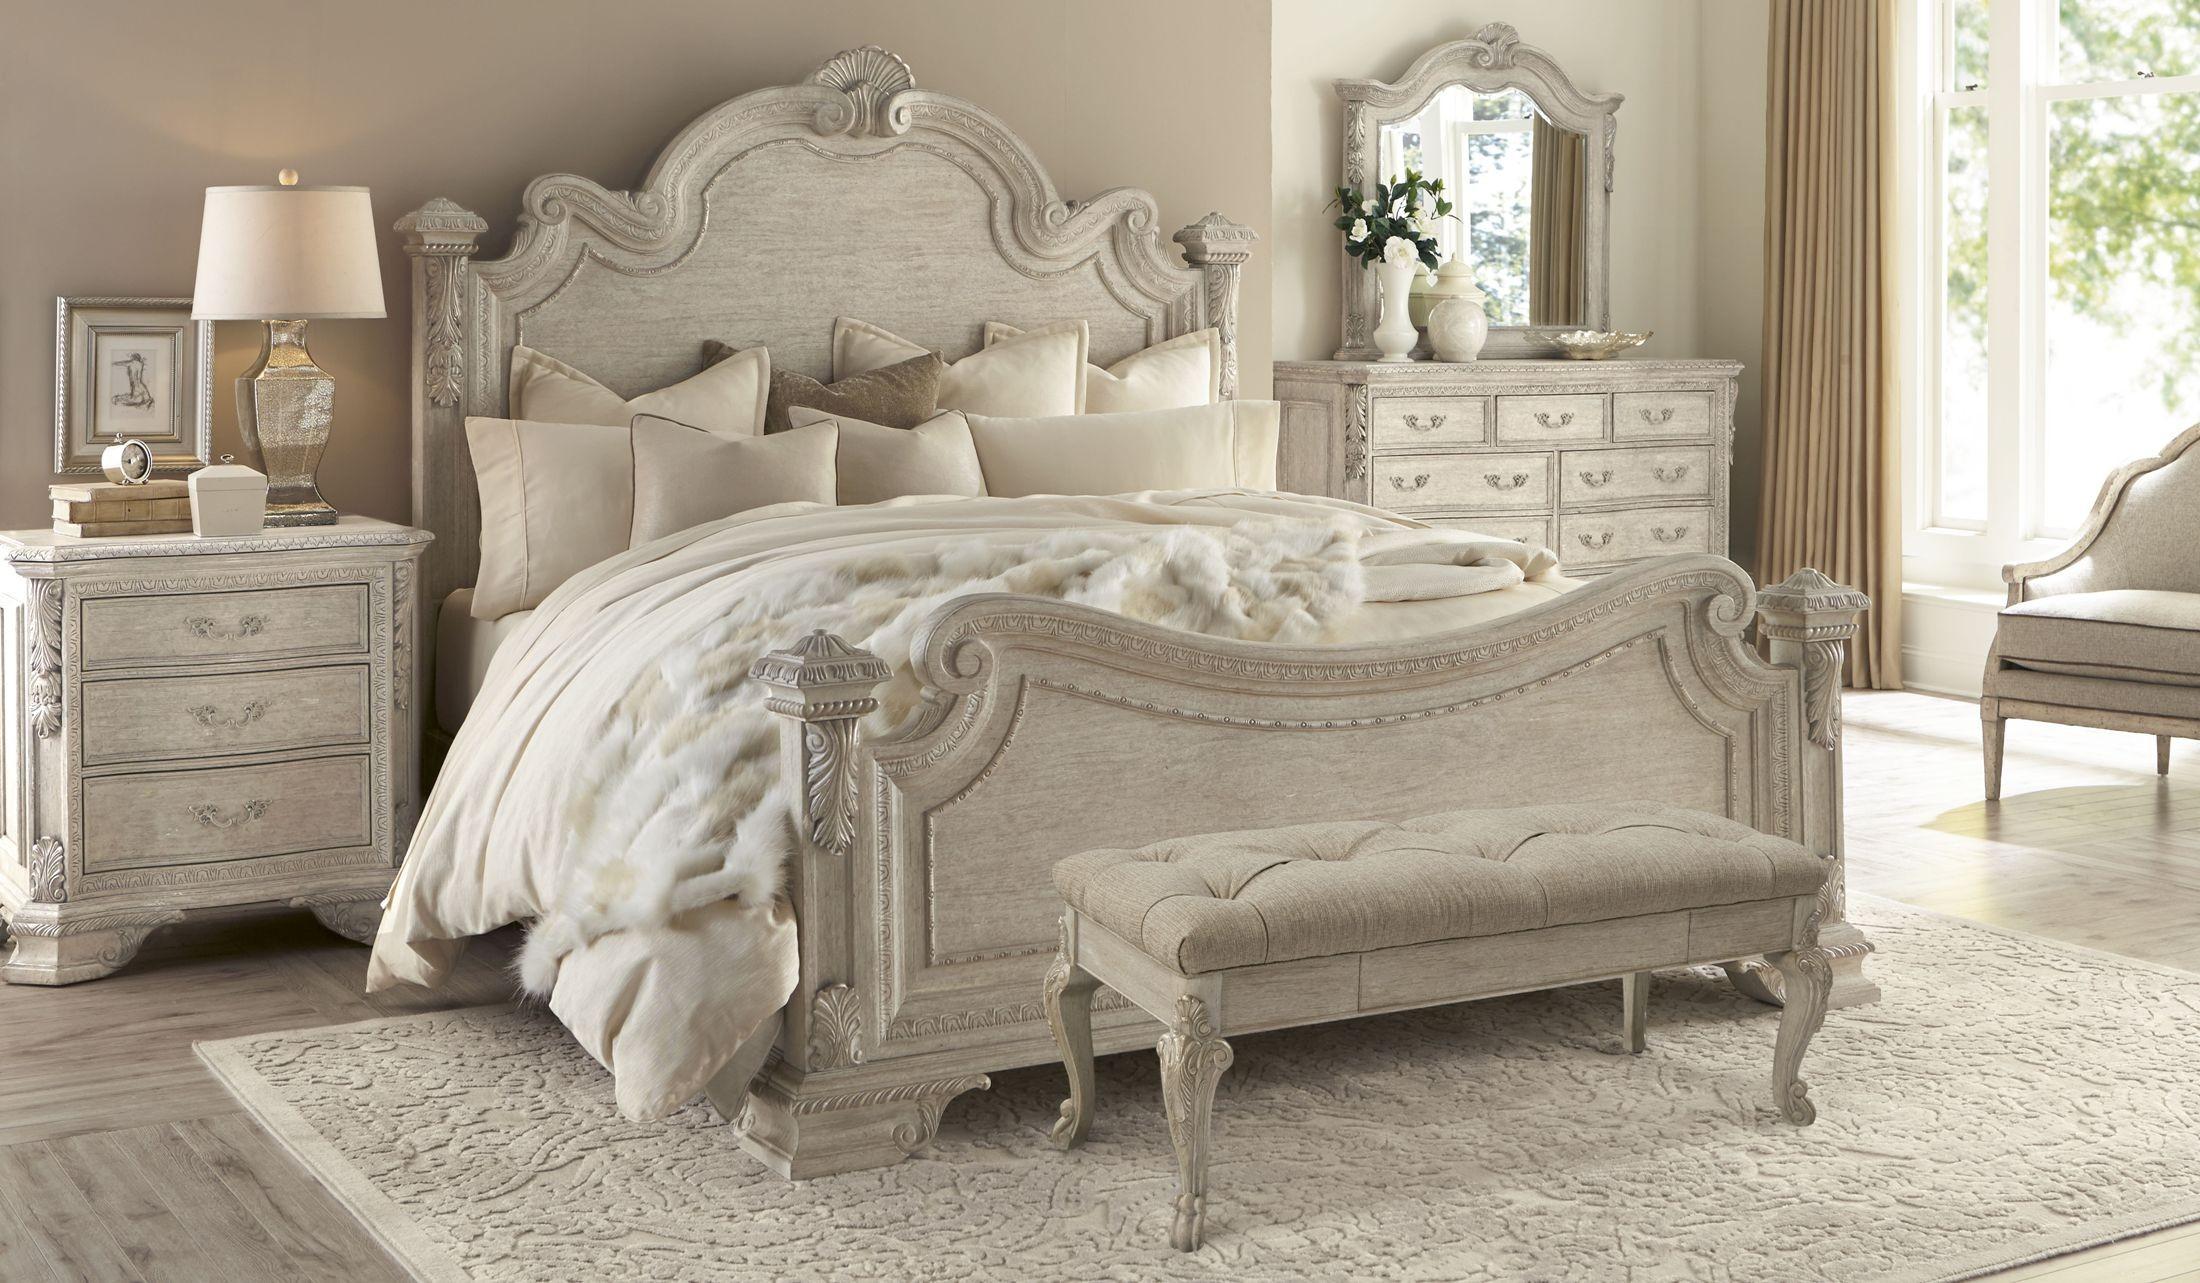 Renaissance Dove Grey Estate Bedroom Set from ART 243155